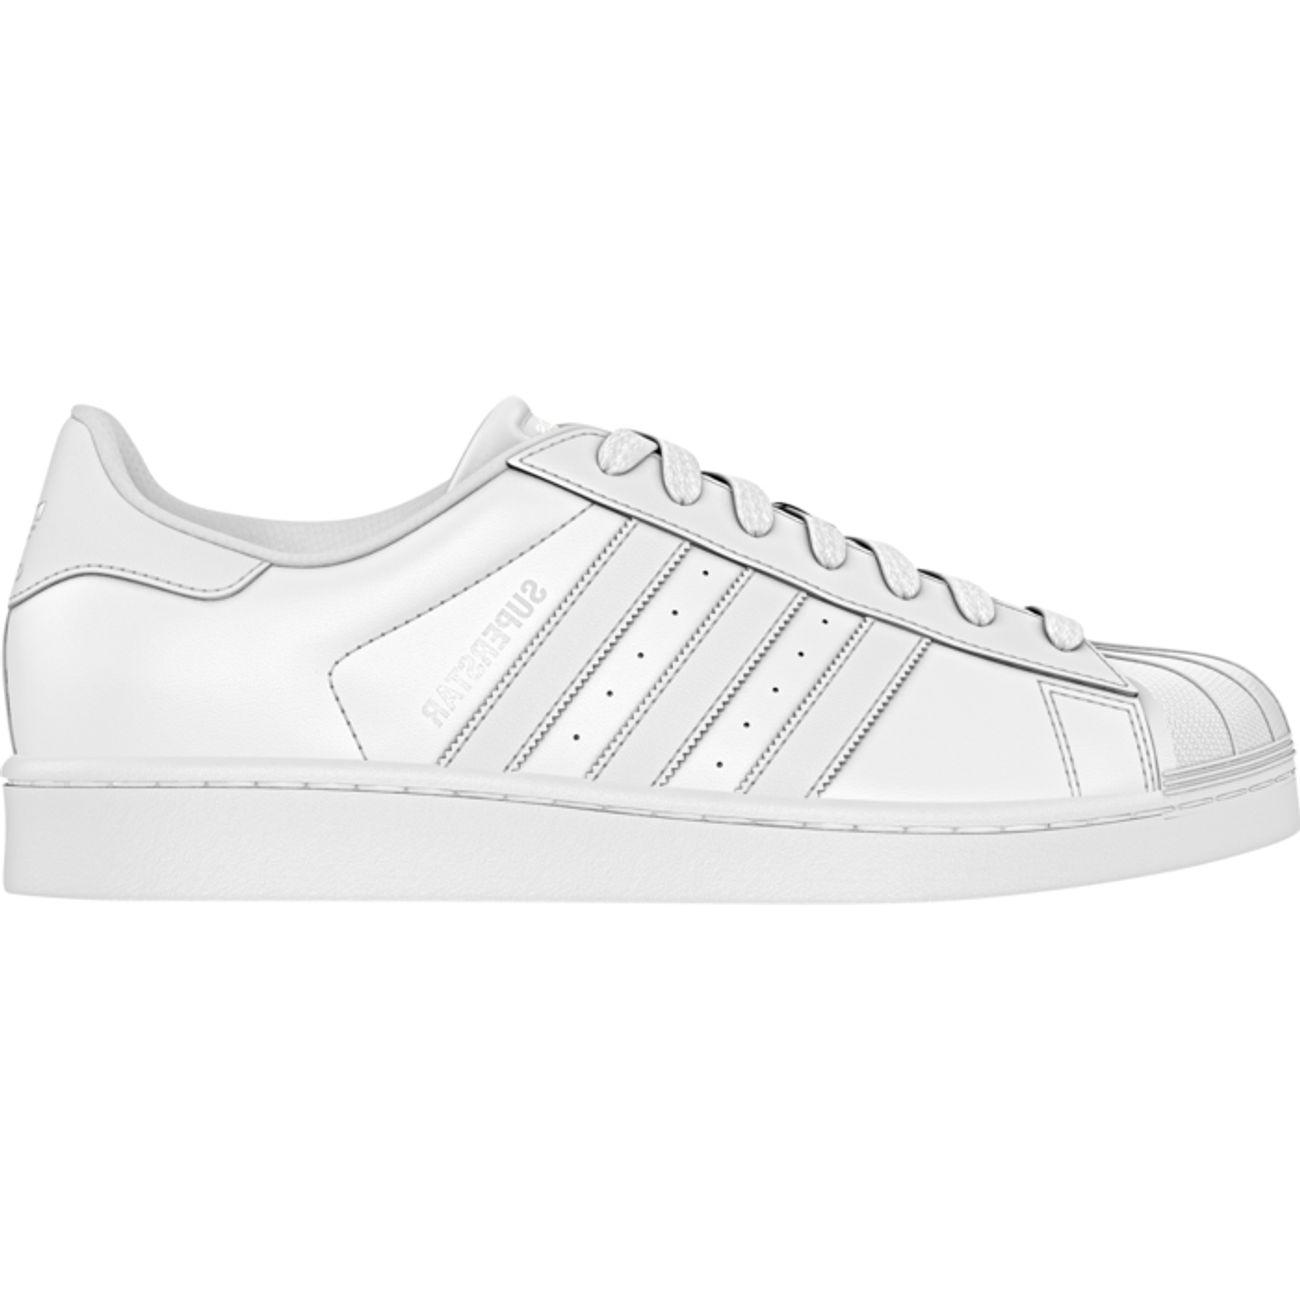 Loisirs Adidas Chaussures Homme Basses Superstar PXwuikOTZ